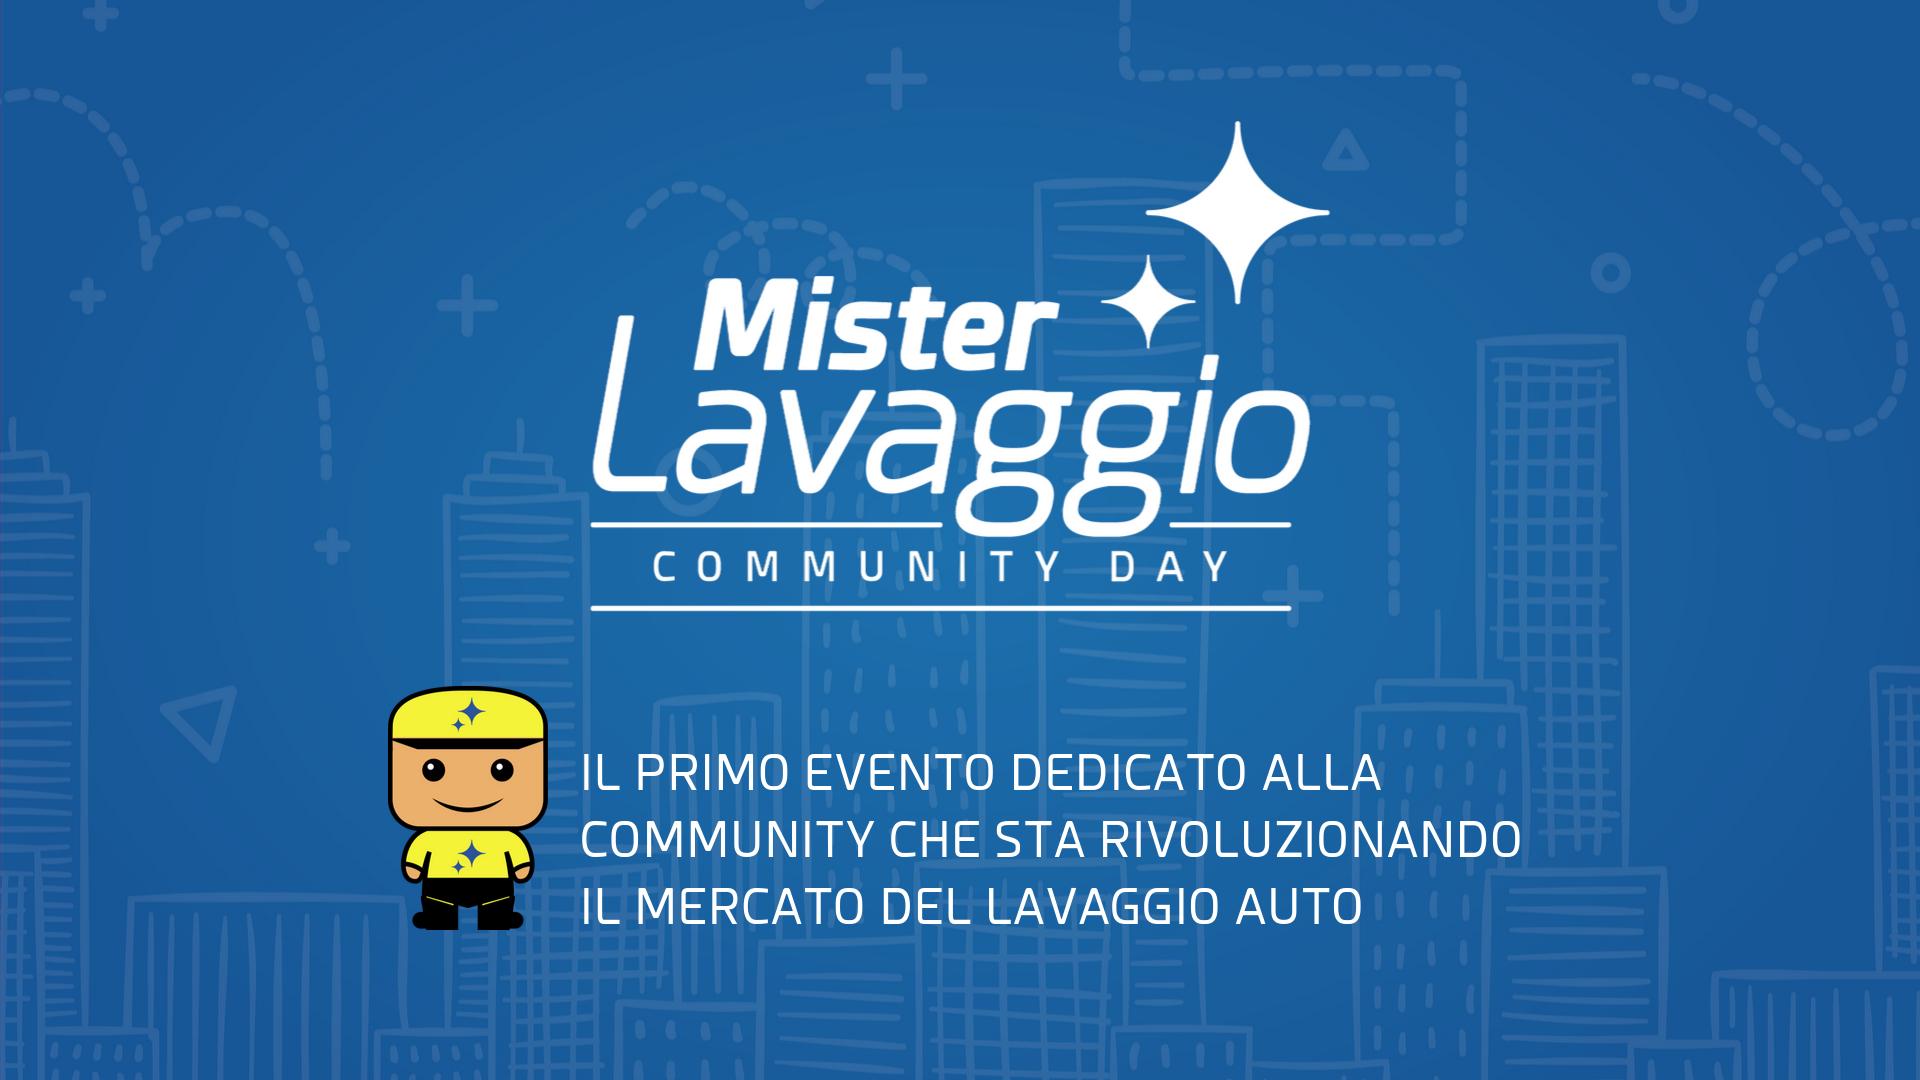 Mister Lavaggio Community Day 2019 MLDAY19 Roma